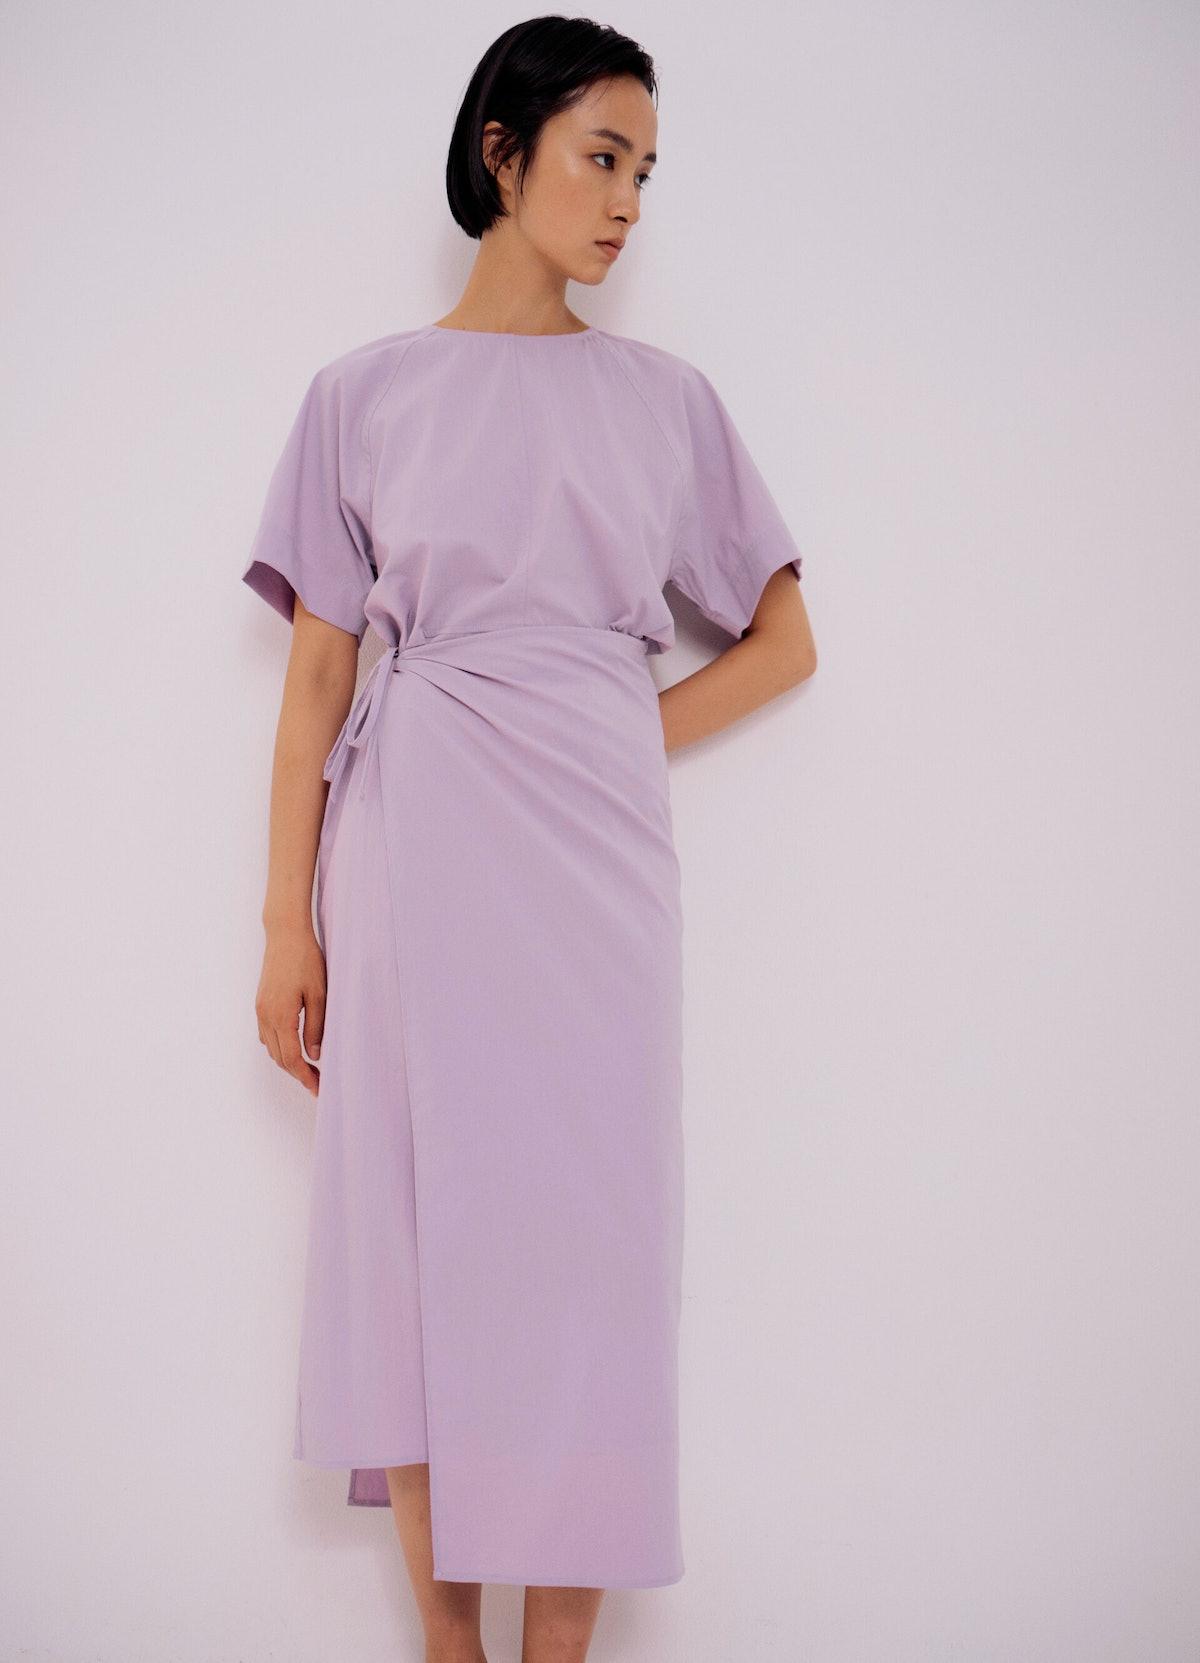 Wrap Dress in Lavender